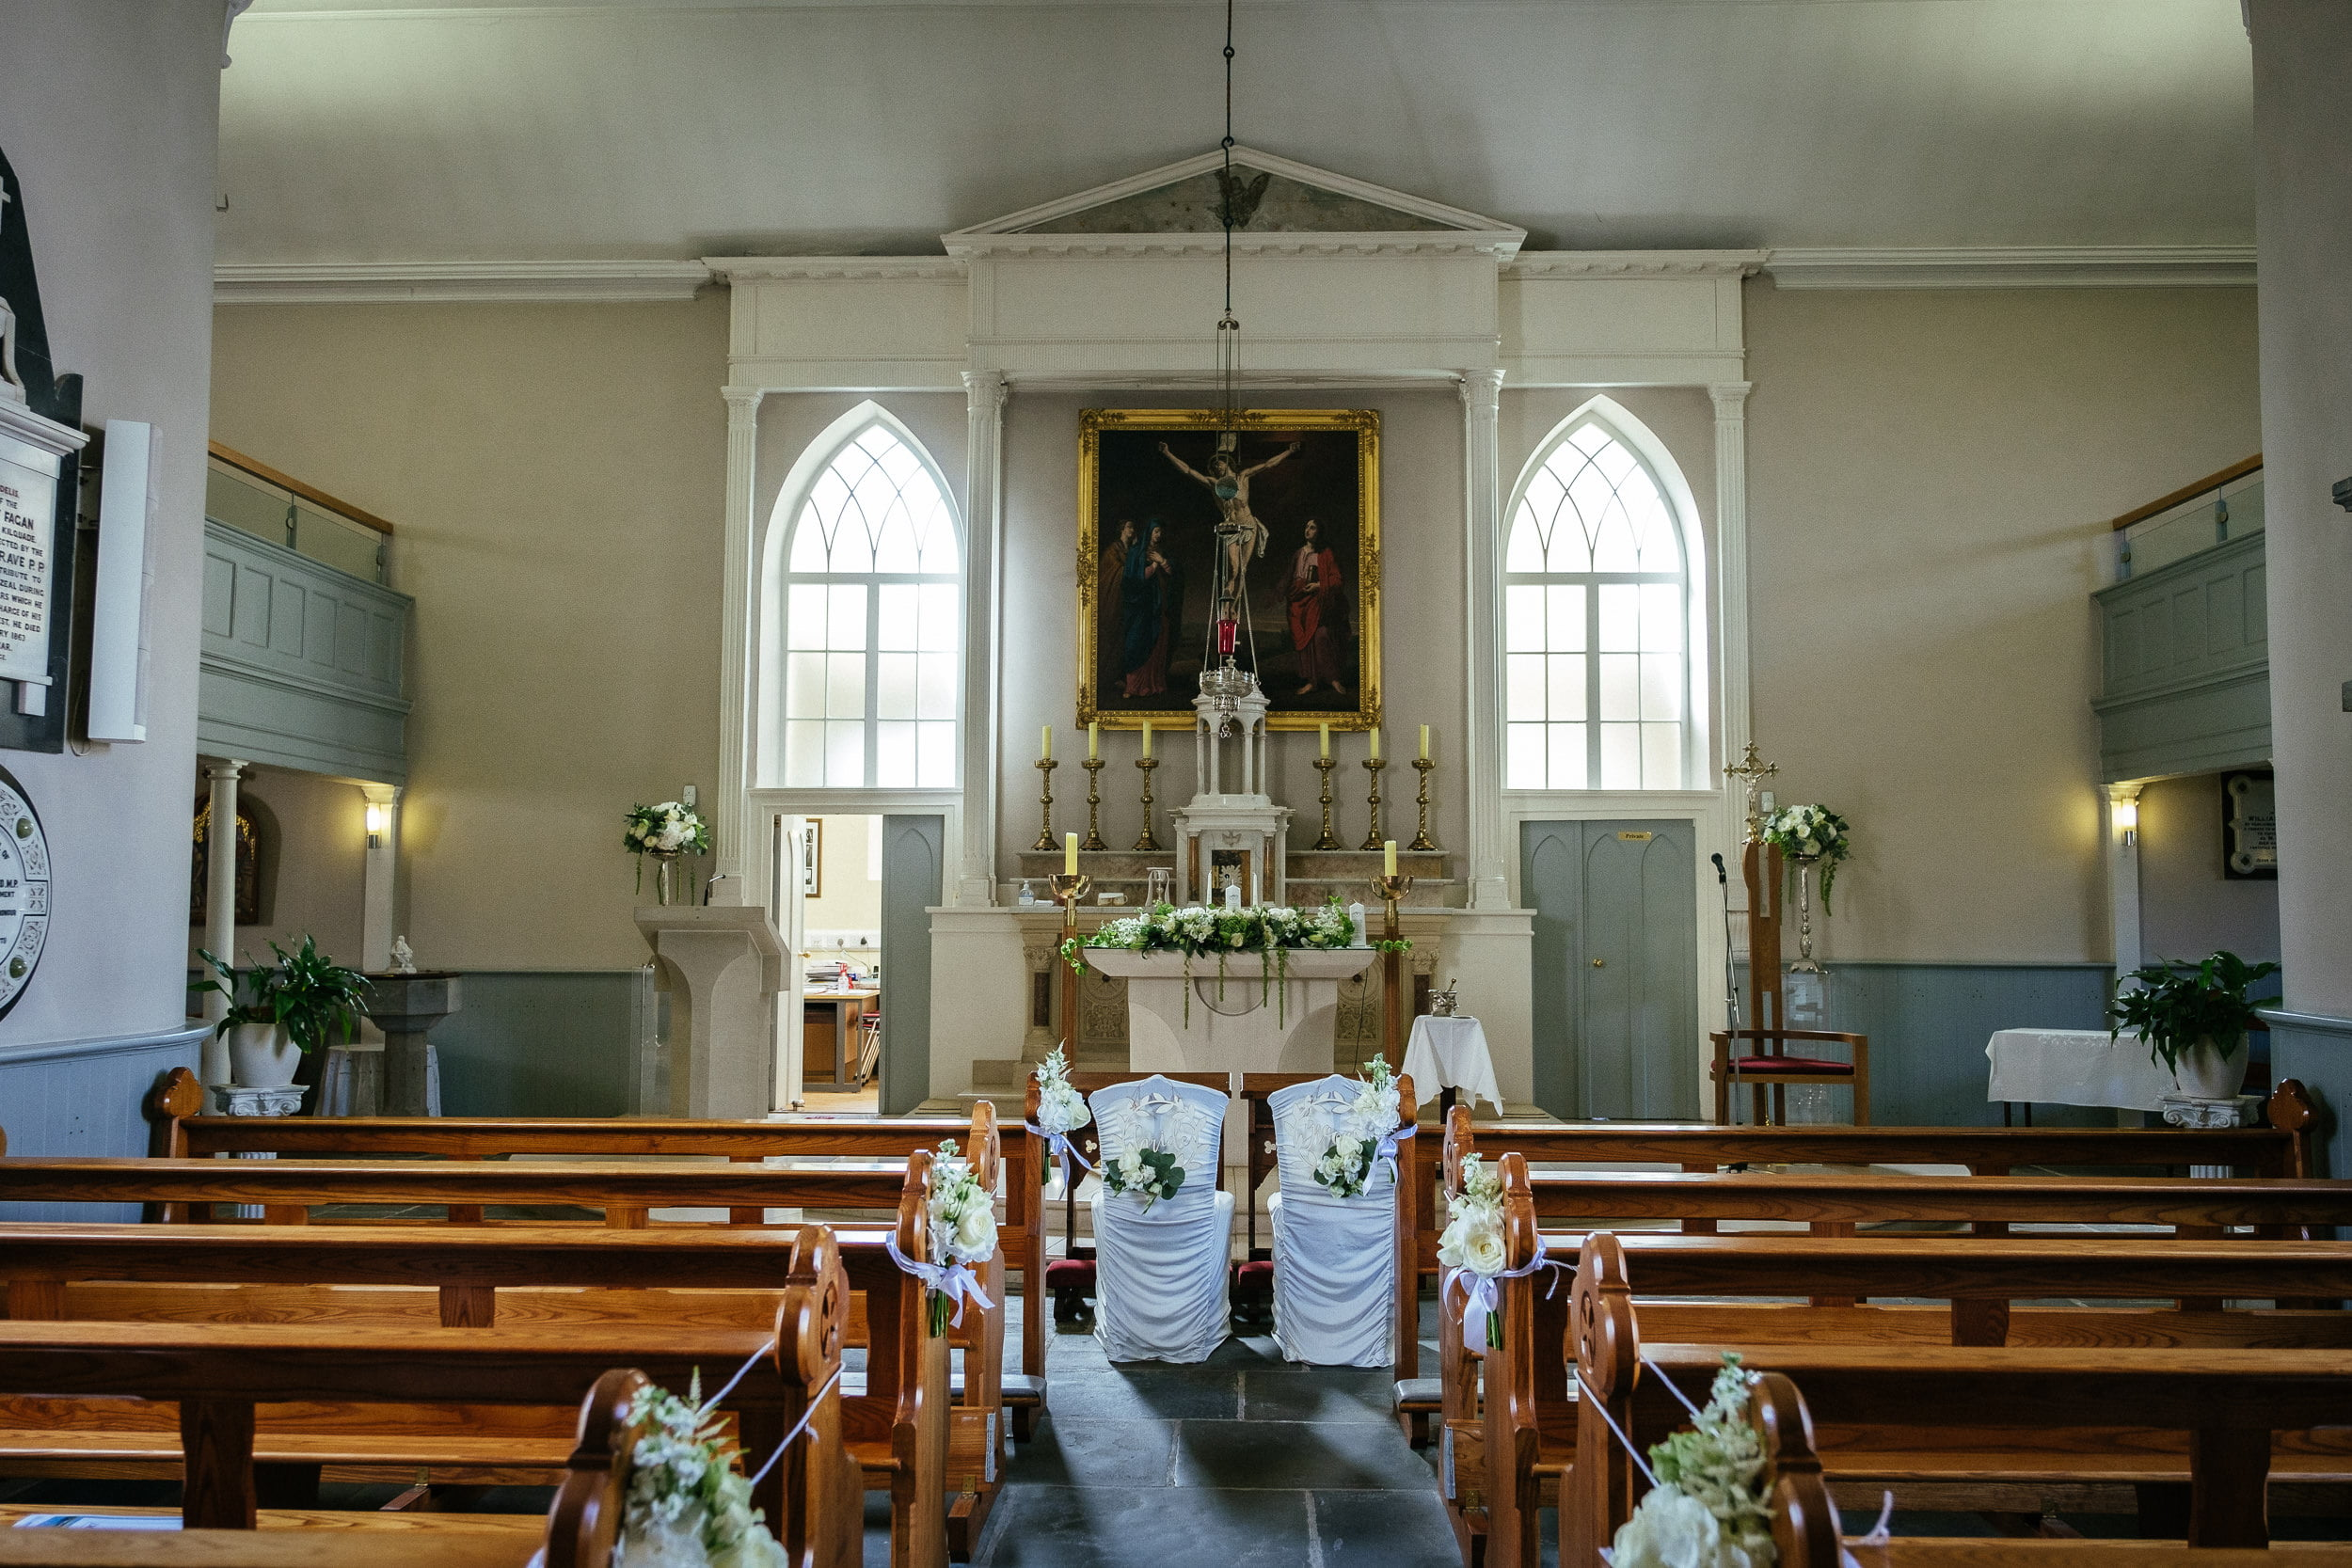 interior of St. Patrick's Church, Kilquade